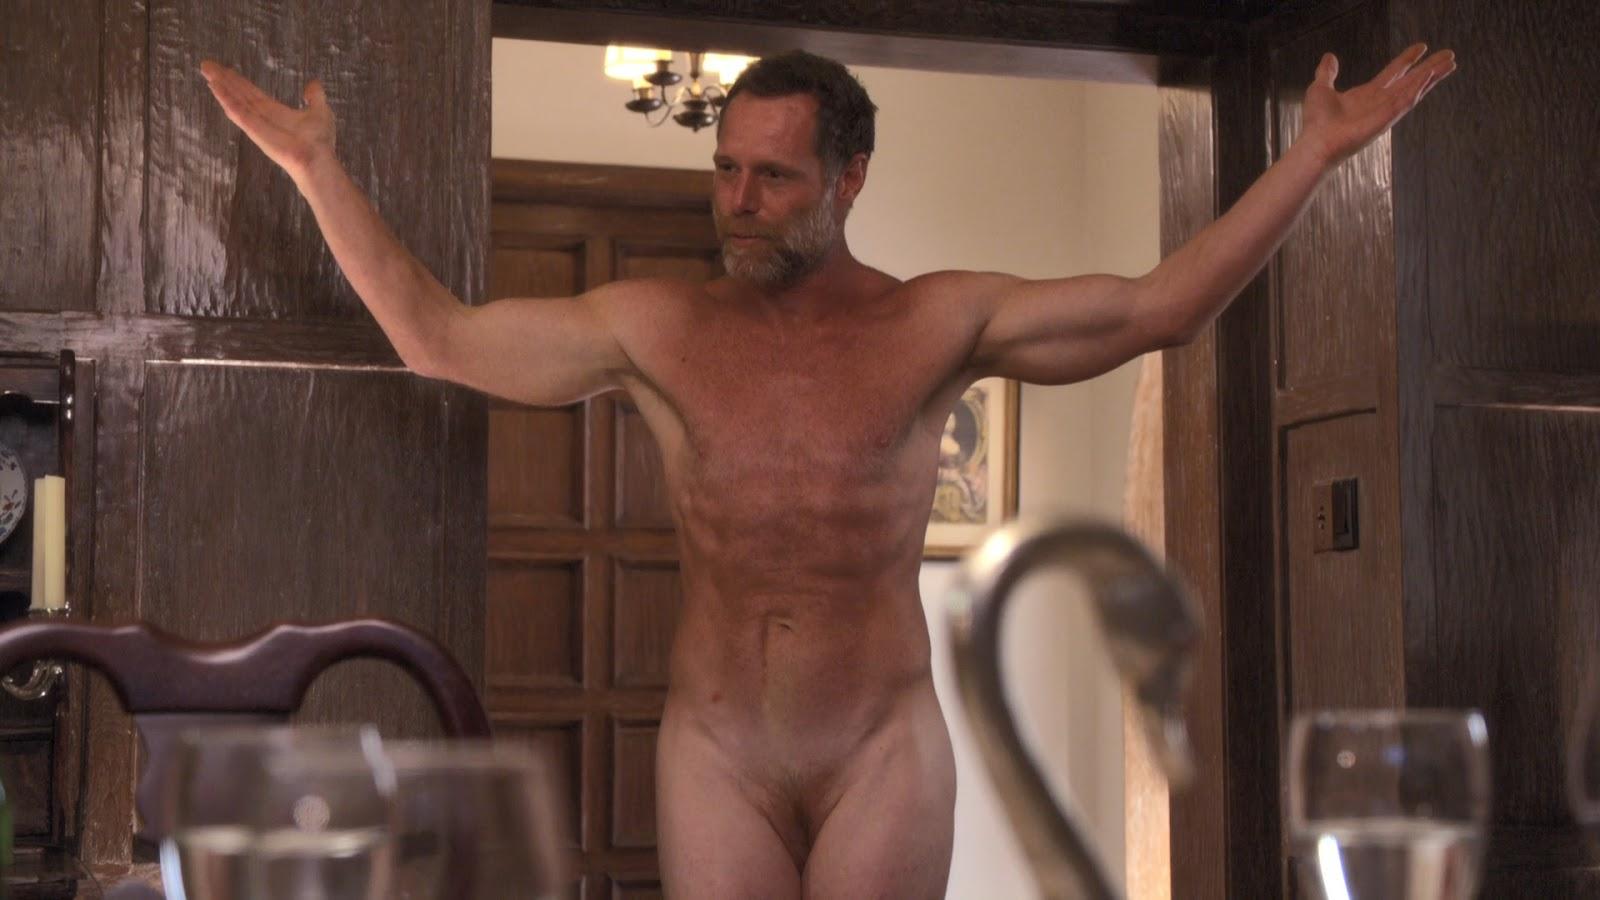 Naked Hot Tub Guys